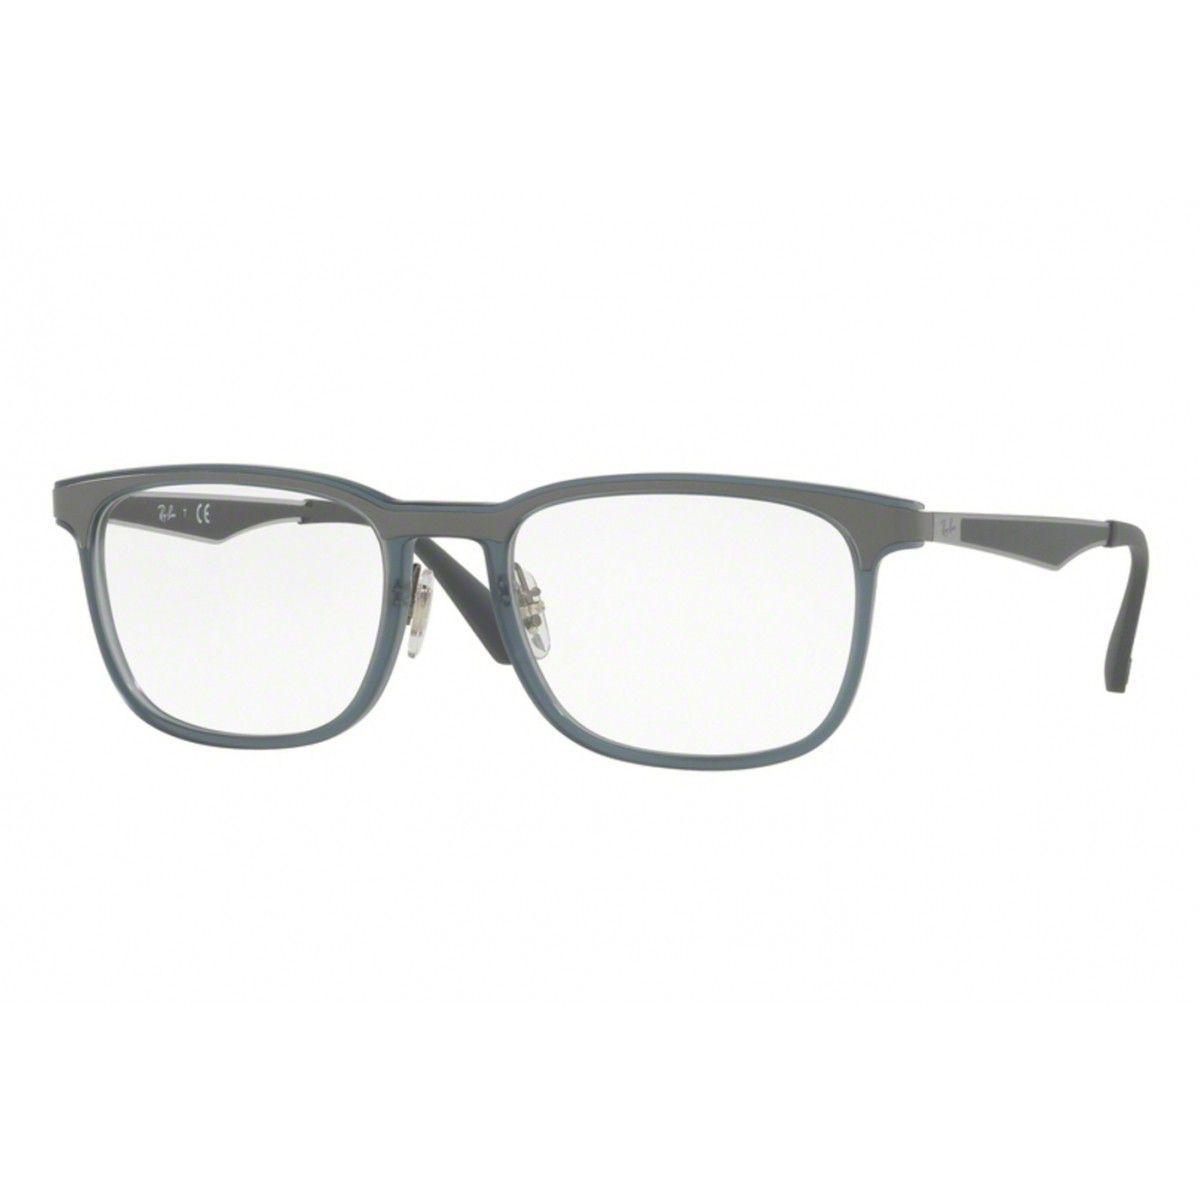 119bd5fabfa3c Óculos De Grau Ray Ban Masculino RB7163 5679 Tam.55 - Ray ban original R